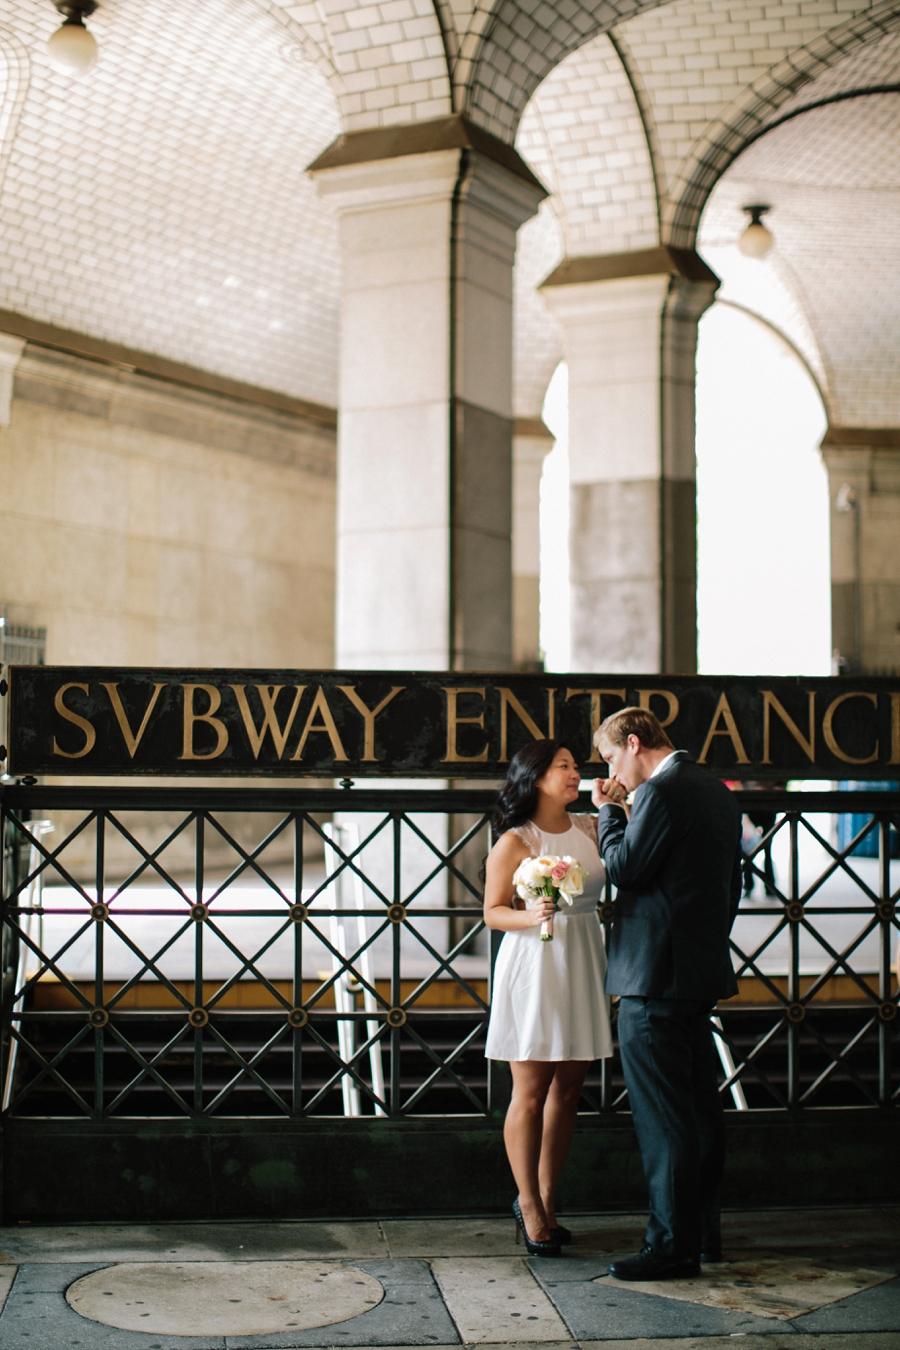 elopement-wedding-photographer-ny-nj-destination_0022.jpg